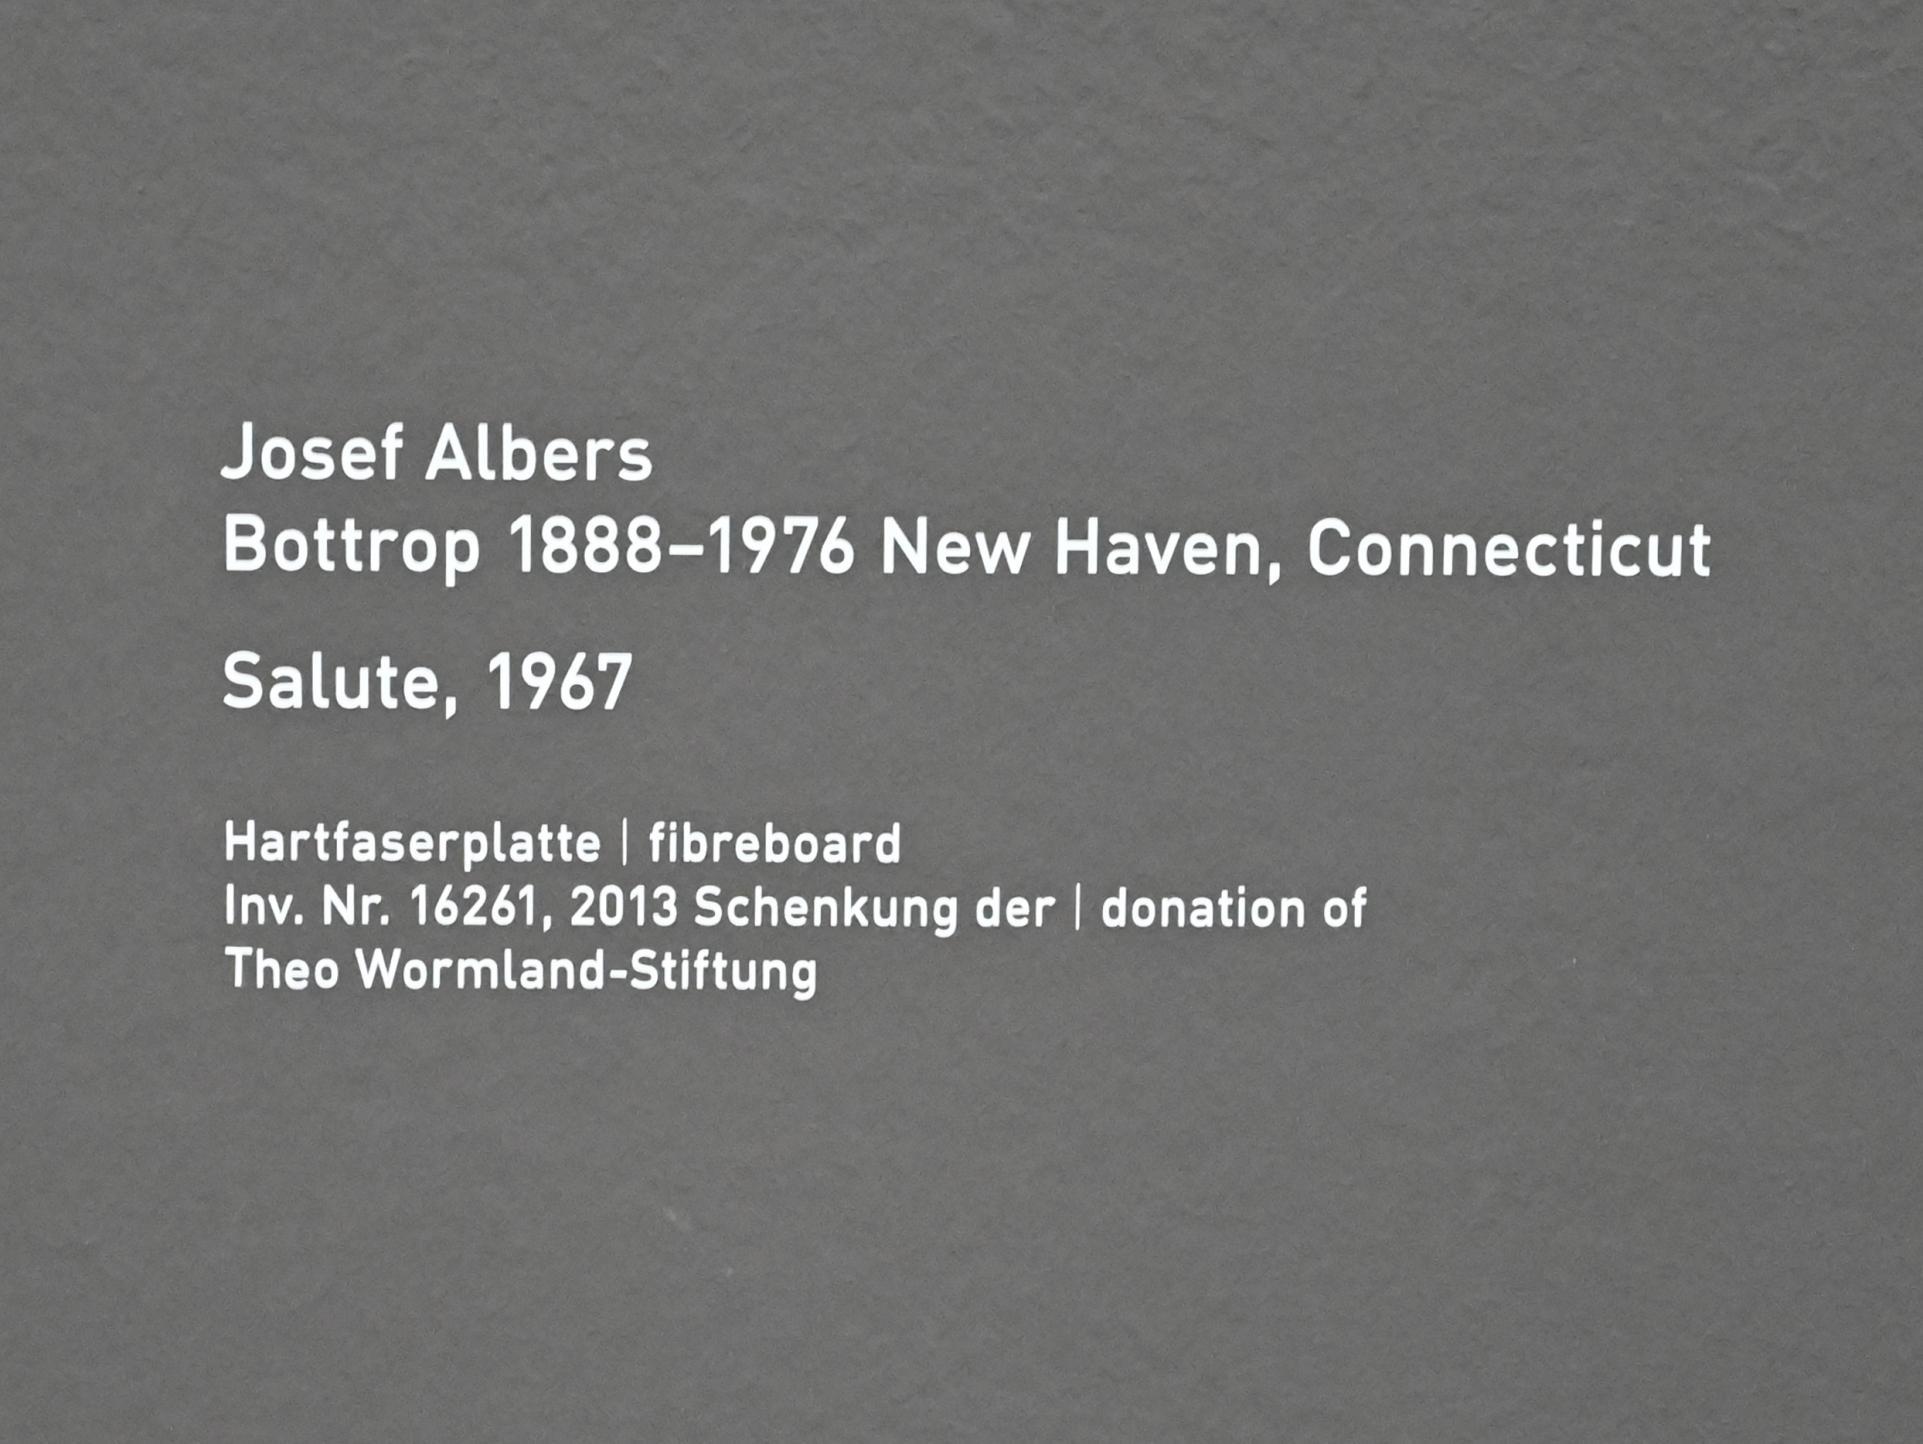 Josef Albers: Salute, 1967, Bild 2/2